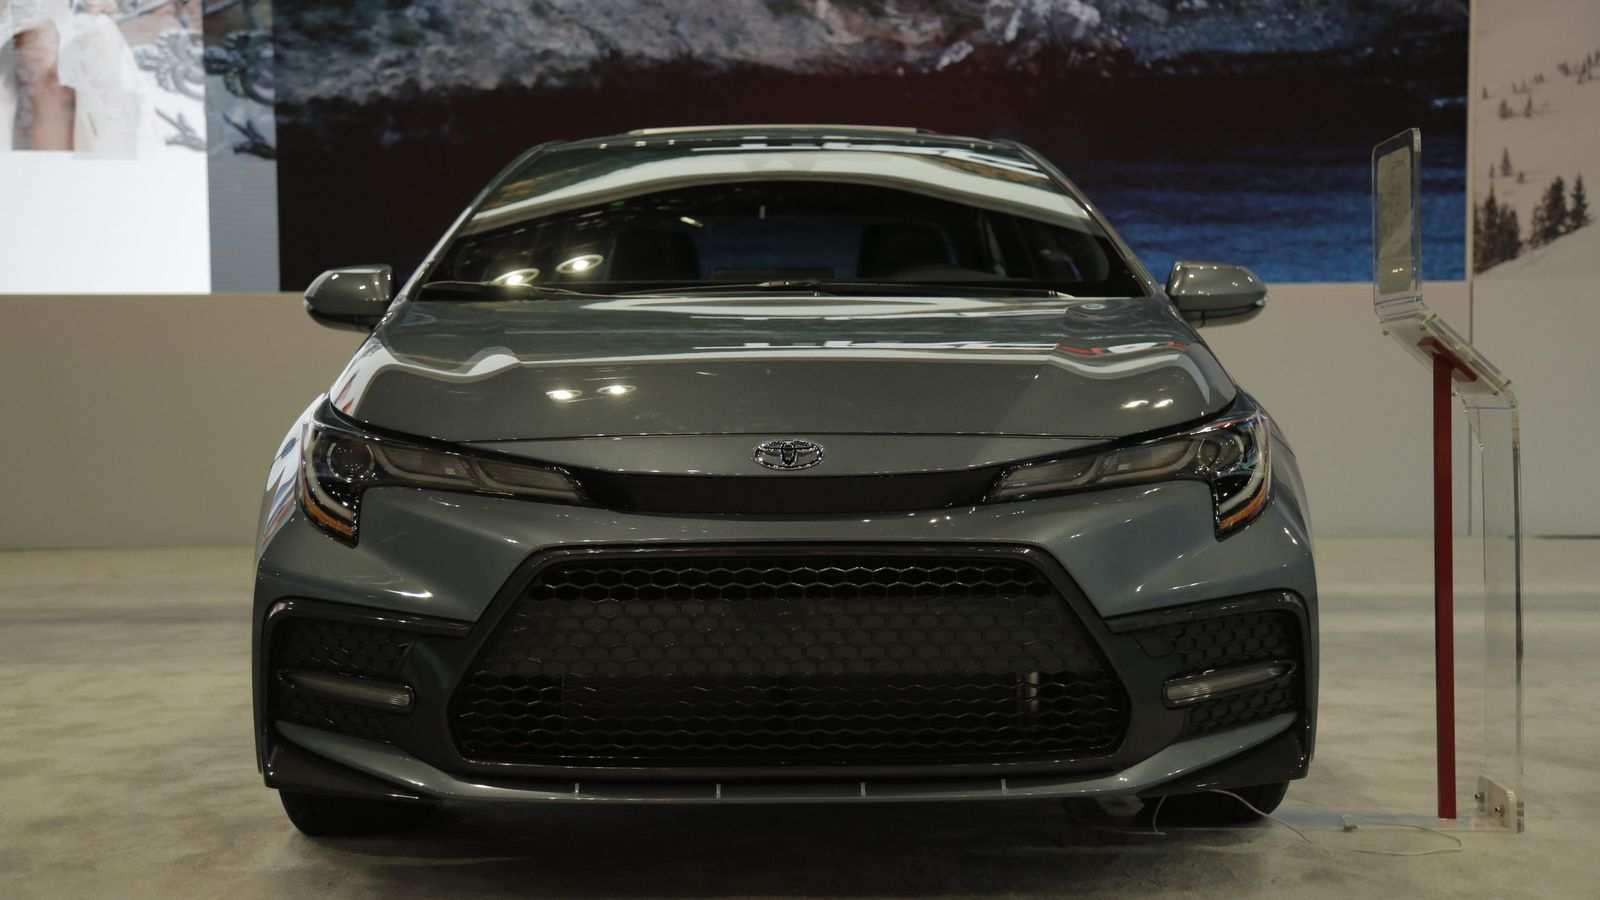 87 New Toyota 2020 Sedan First Drive for Toyota 2020 Sedan